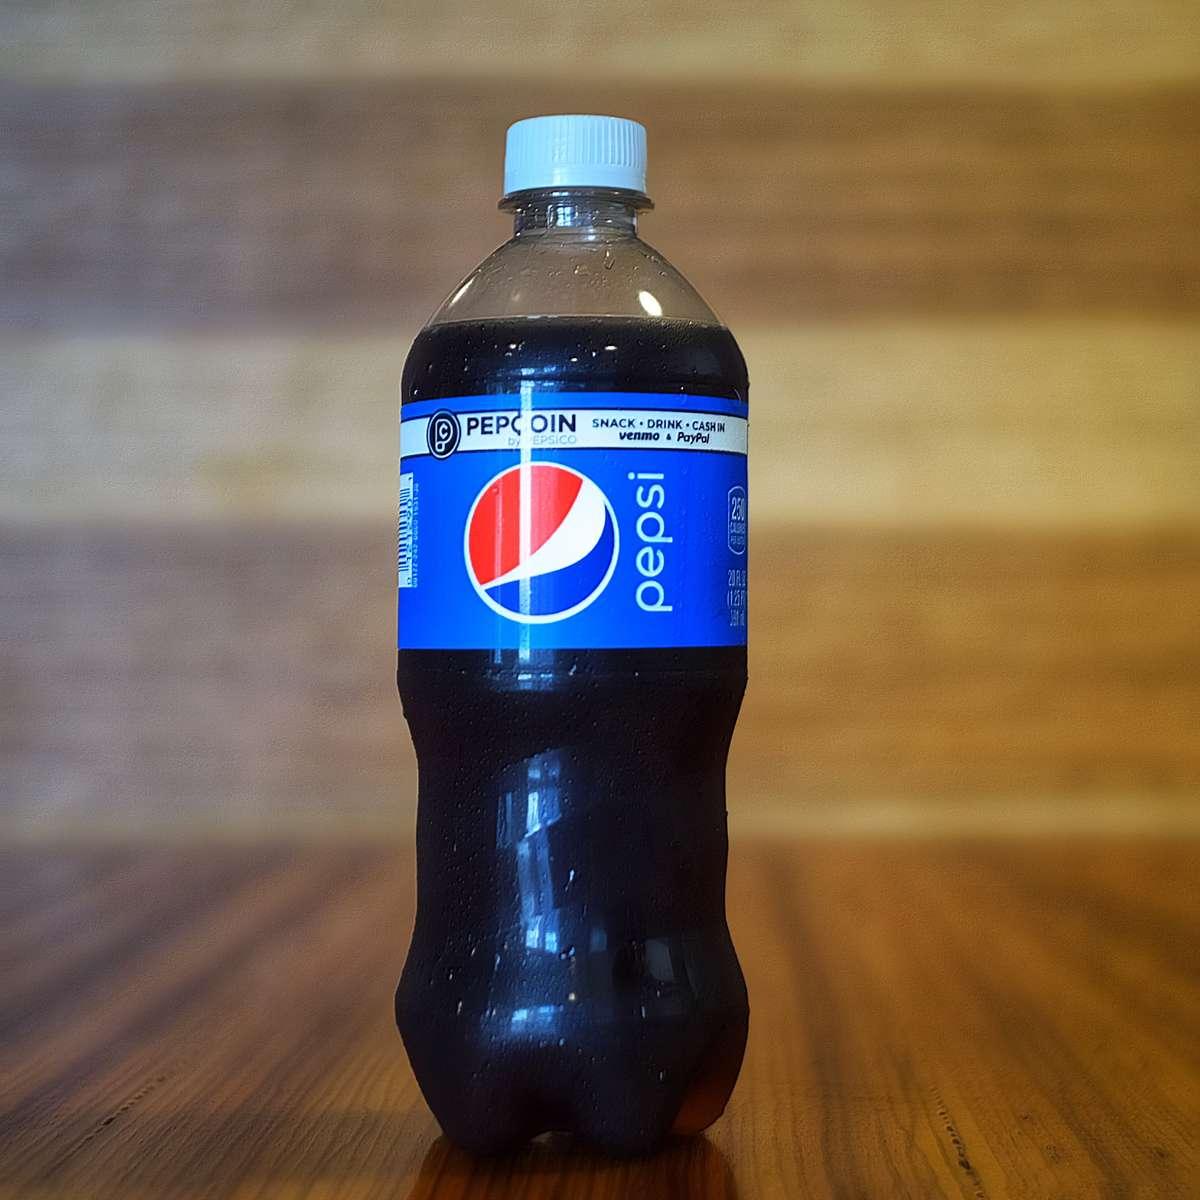 Pepsi 20 oz bottle